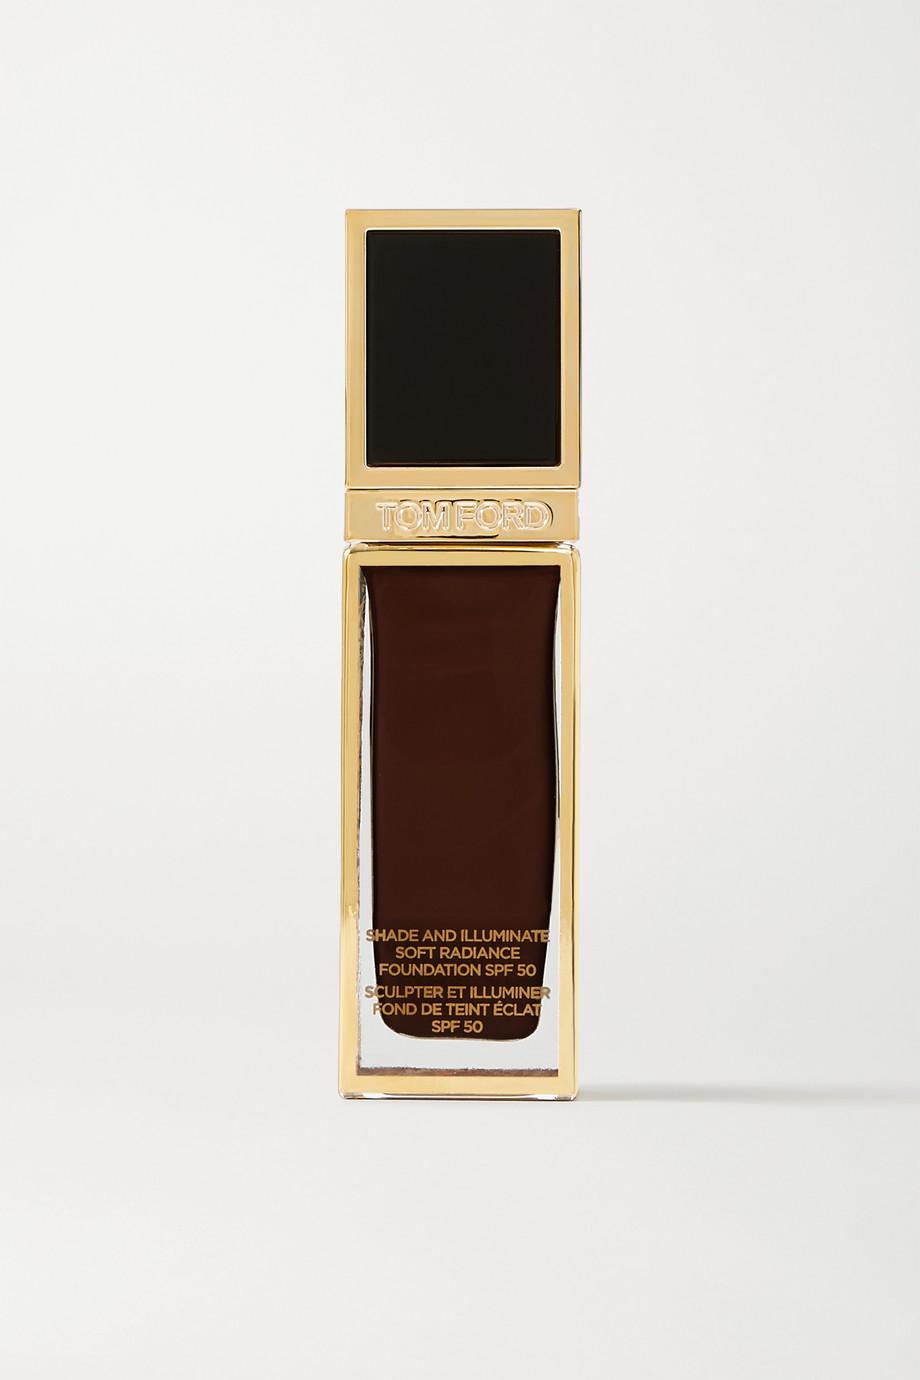 TOM FORD BEAUTY Shade and Illuminate Soft Radiance Foundation SPF50 - 11.7 Nutmeg, 30ml